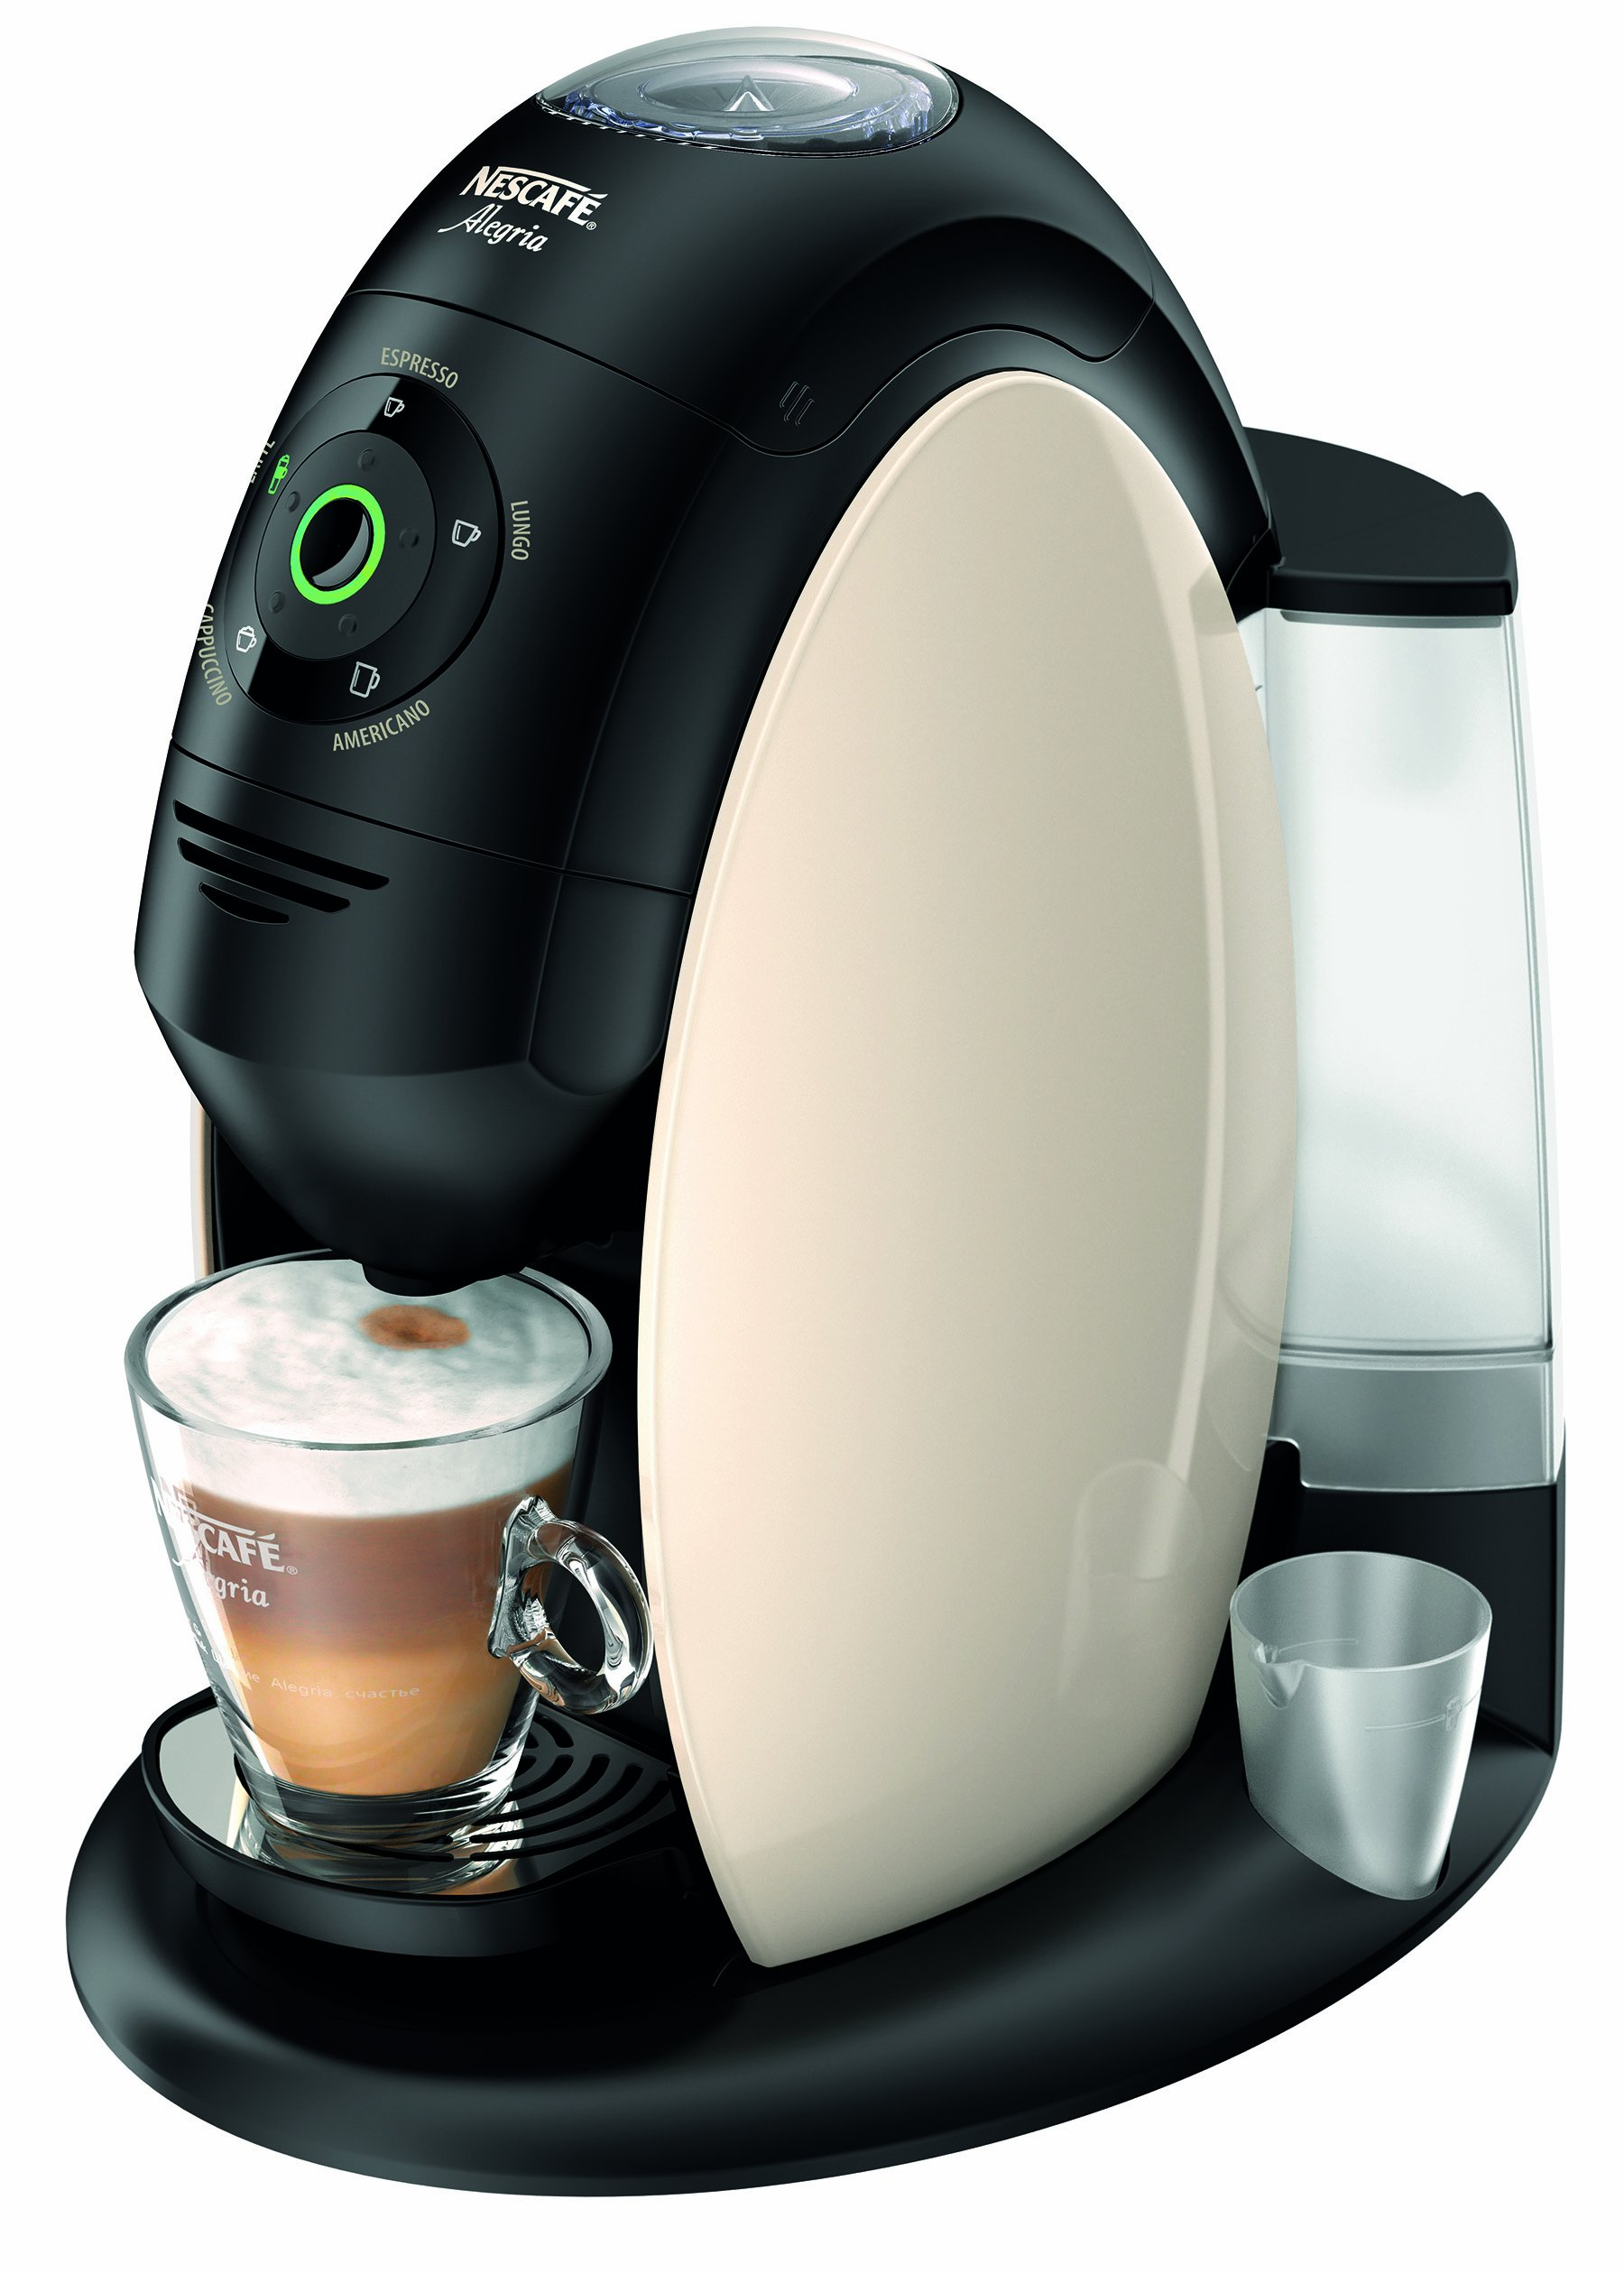 Nescafe Alegria 510 Barista Coffee Machine